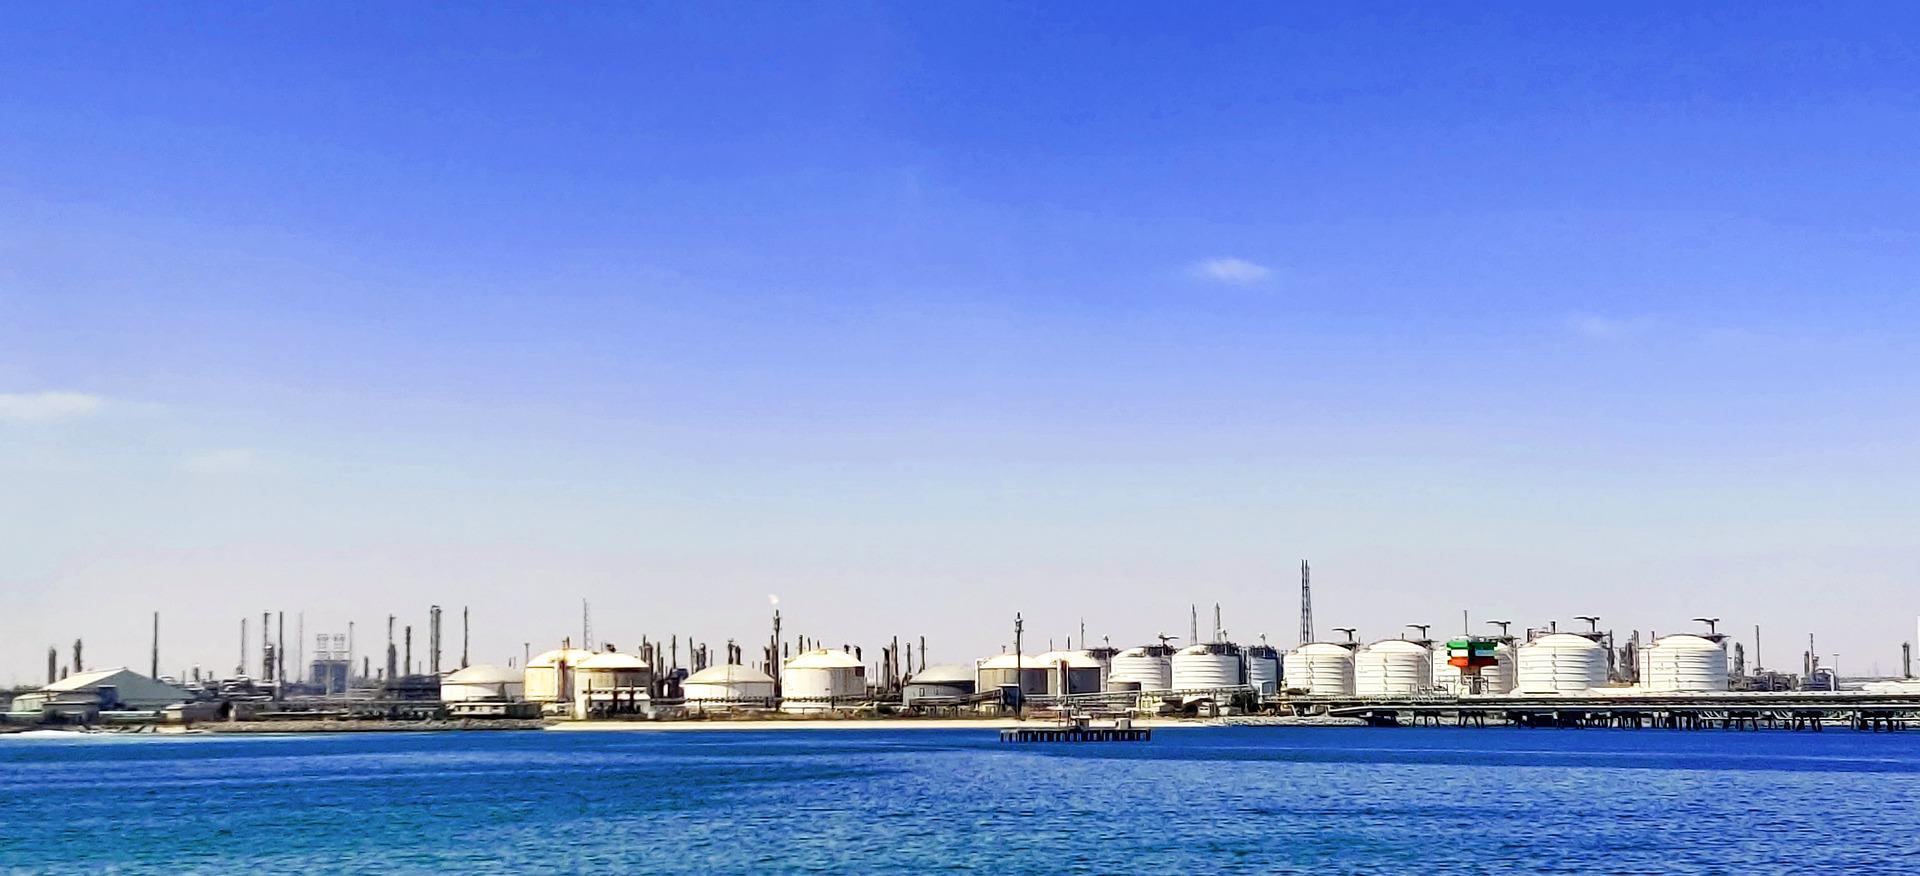 Shell PCK refinery